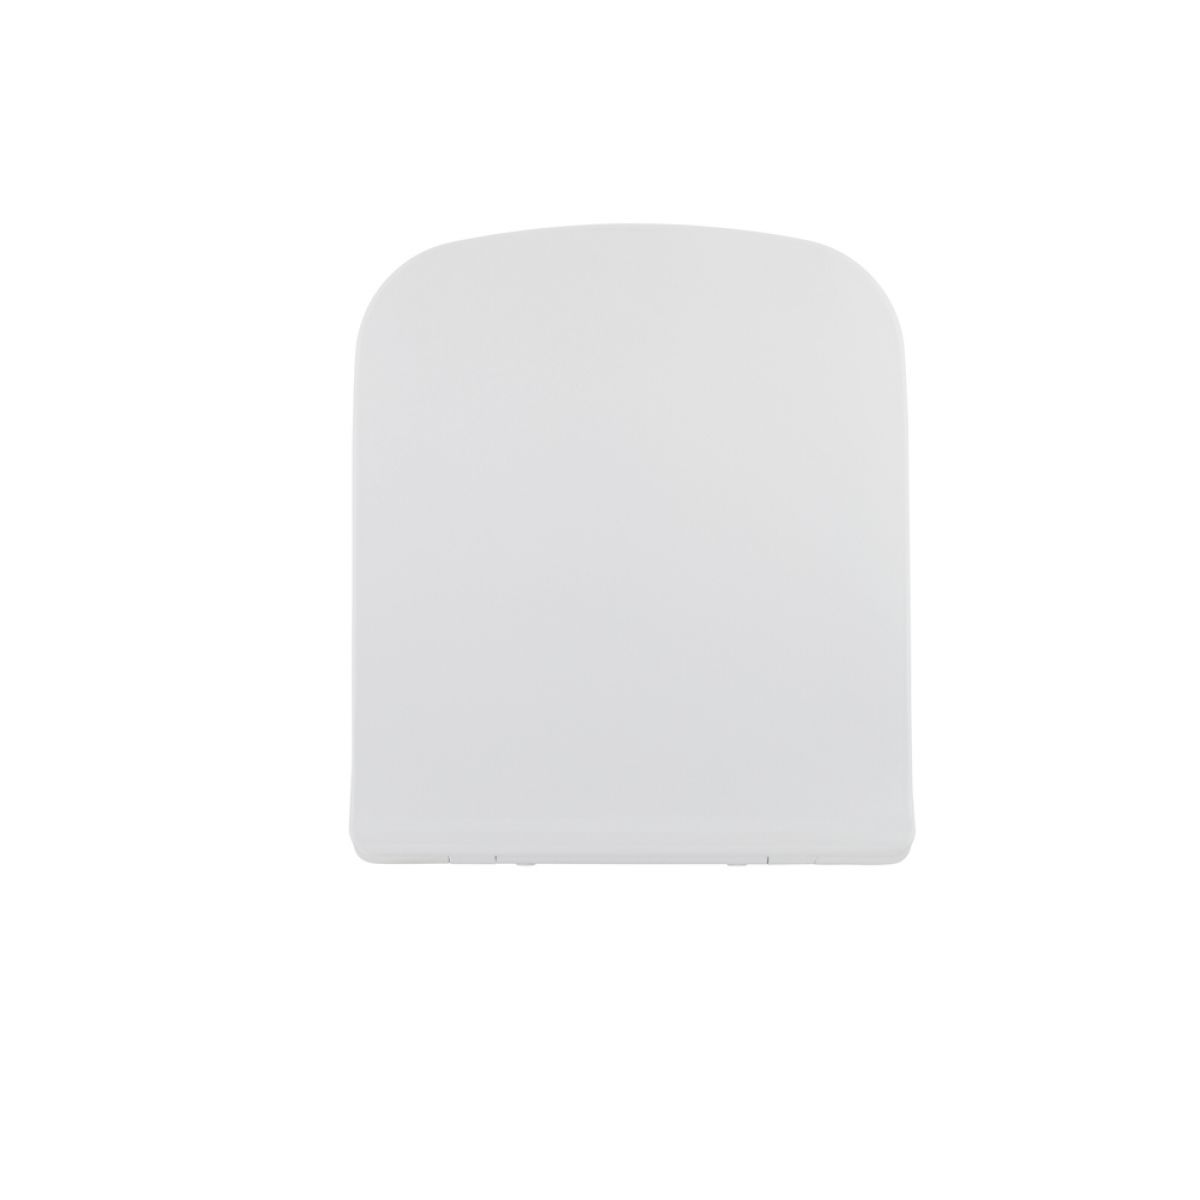 Cassellie Fair Slimline Soft Close Toilet Seat